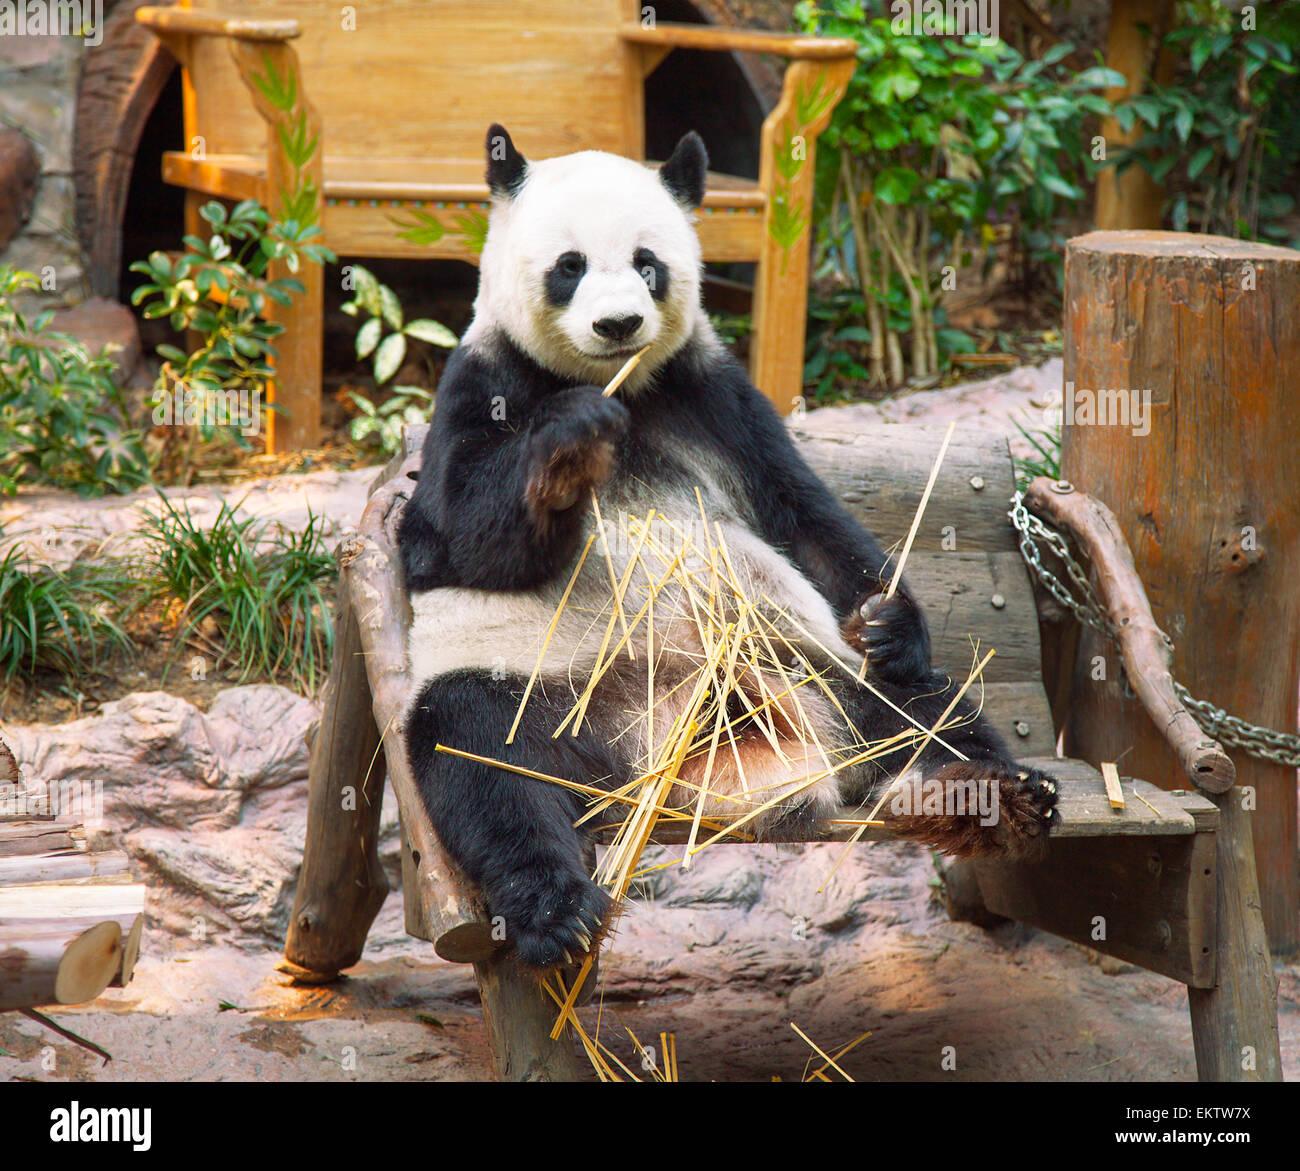 Giant panda bear eating bamboo in Chiang Mai Zoo, Thailand - Stock Image